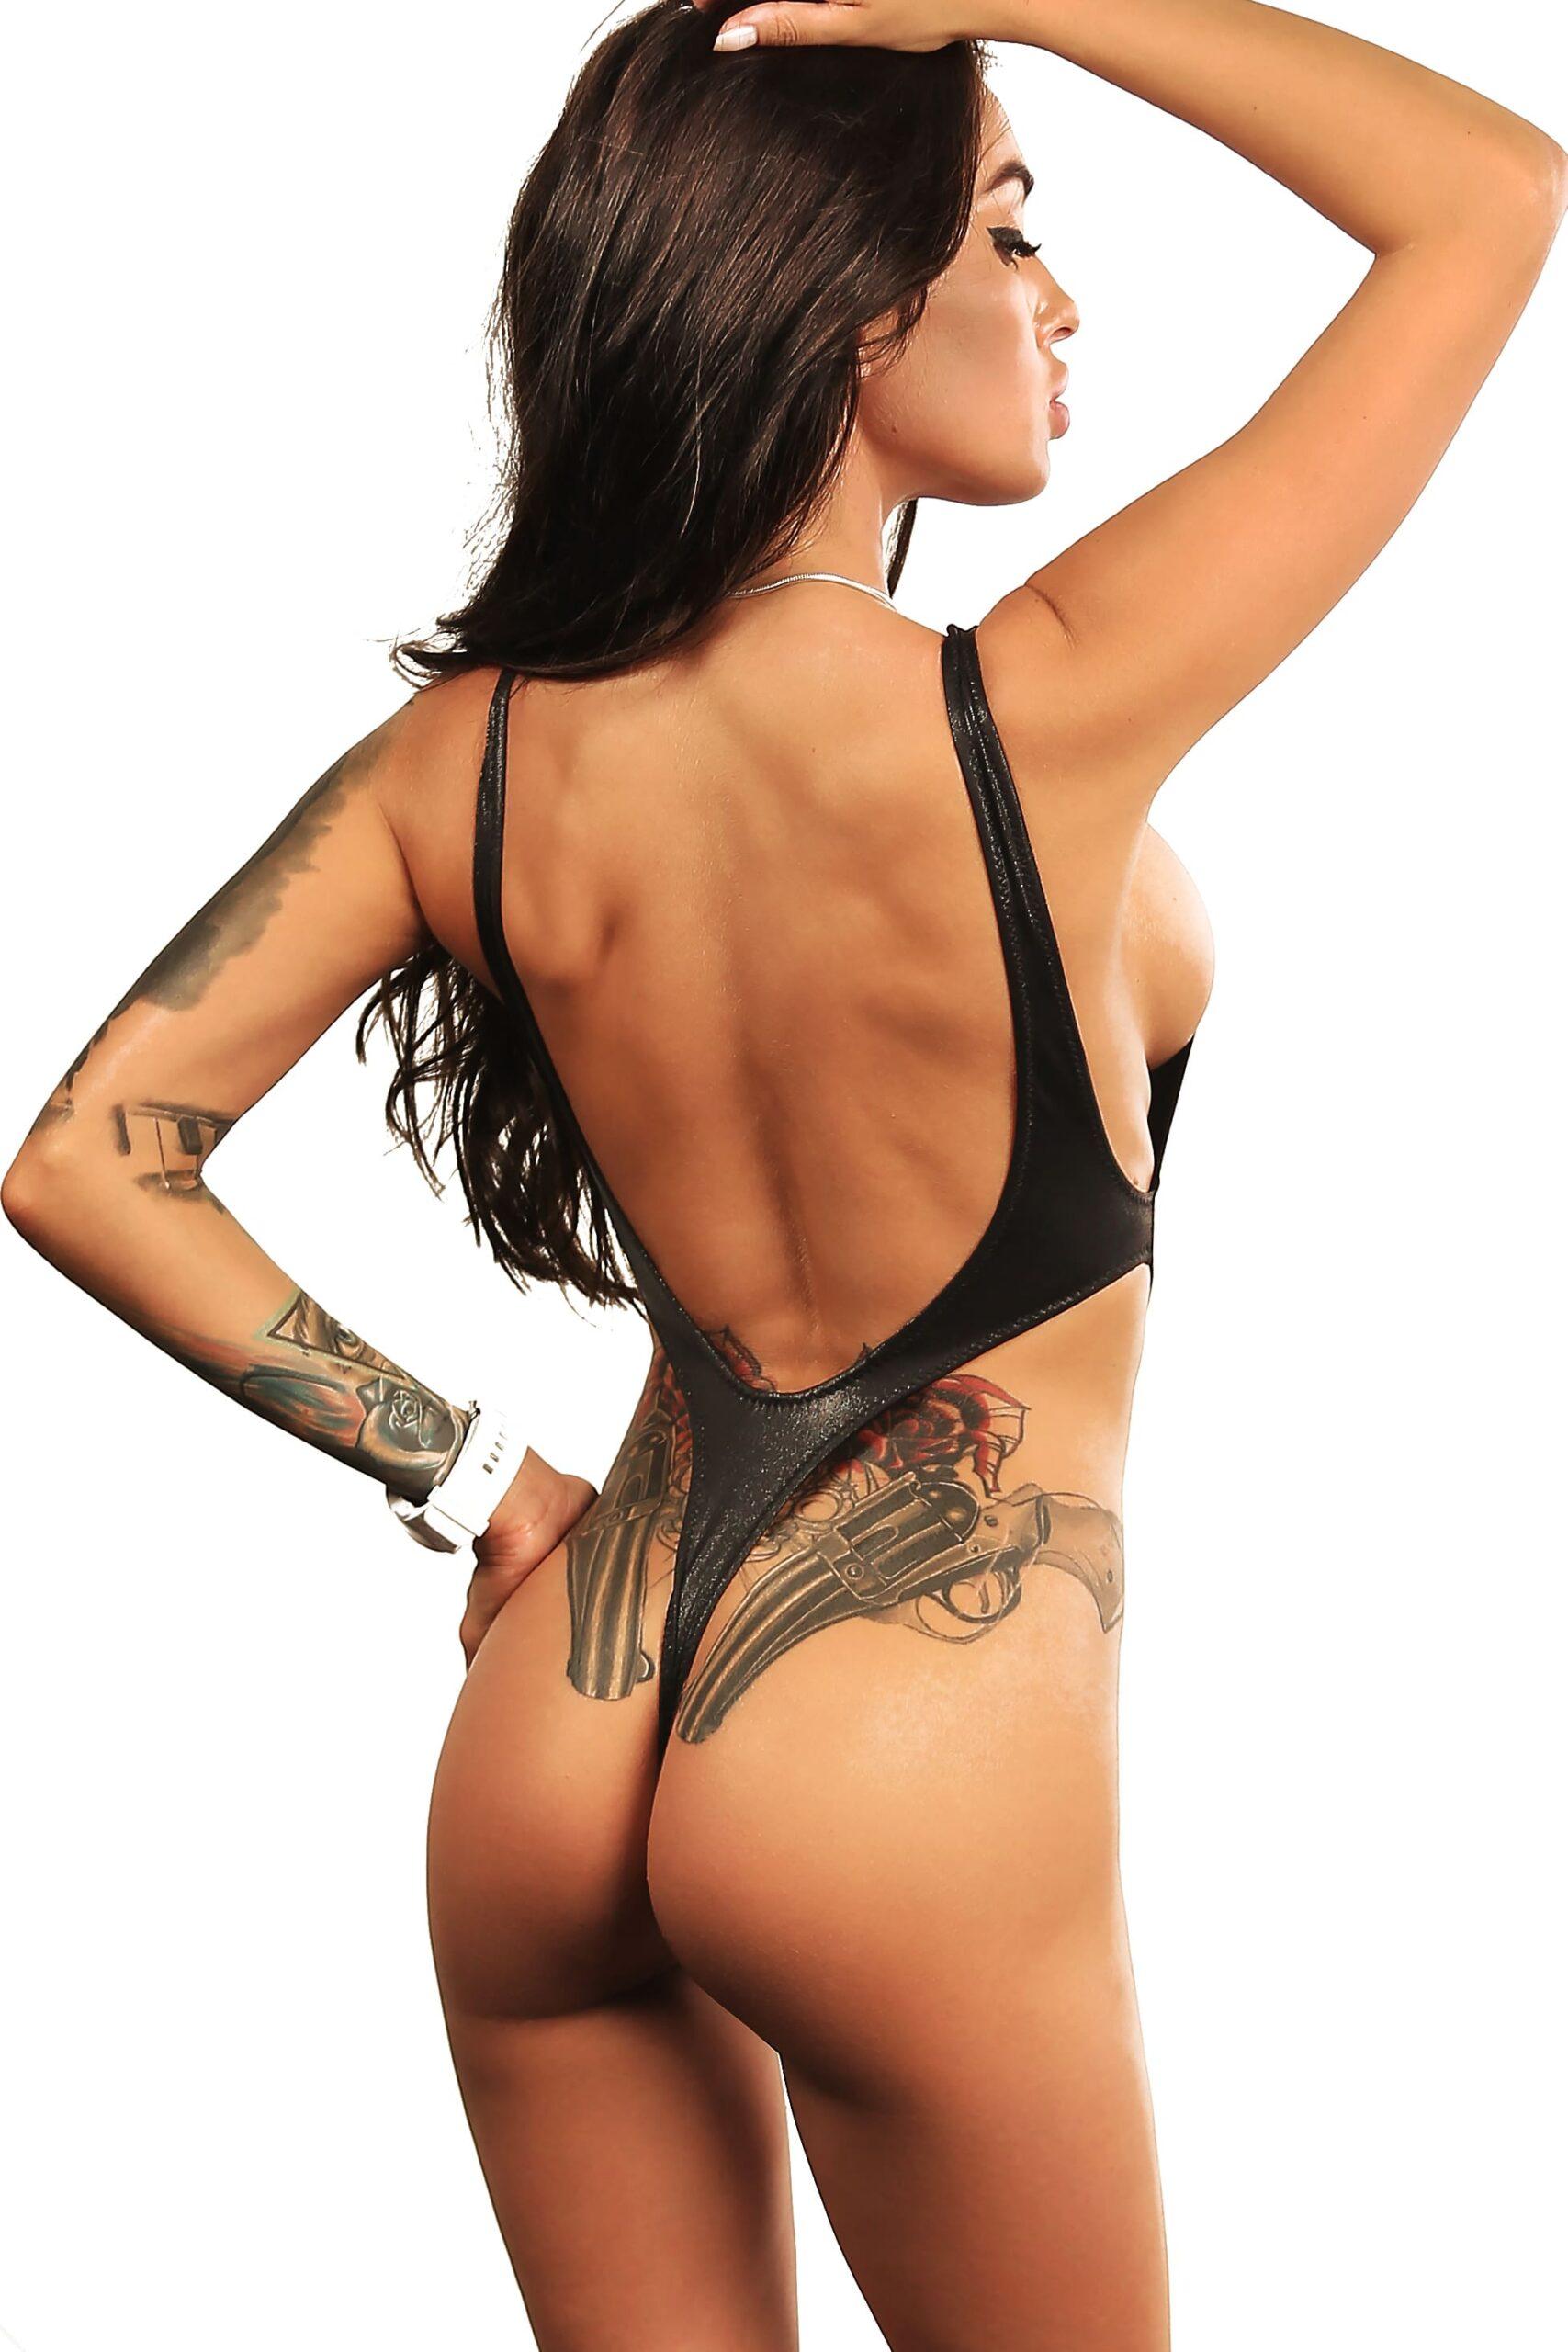 Sexy tummy cut one piece thong swimsuit monokini. Hot cheeky high cut leg bodysuit. Extreme stripper outfits. Cute designer women swimwear.